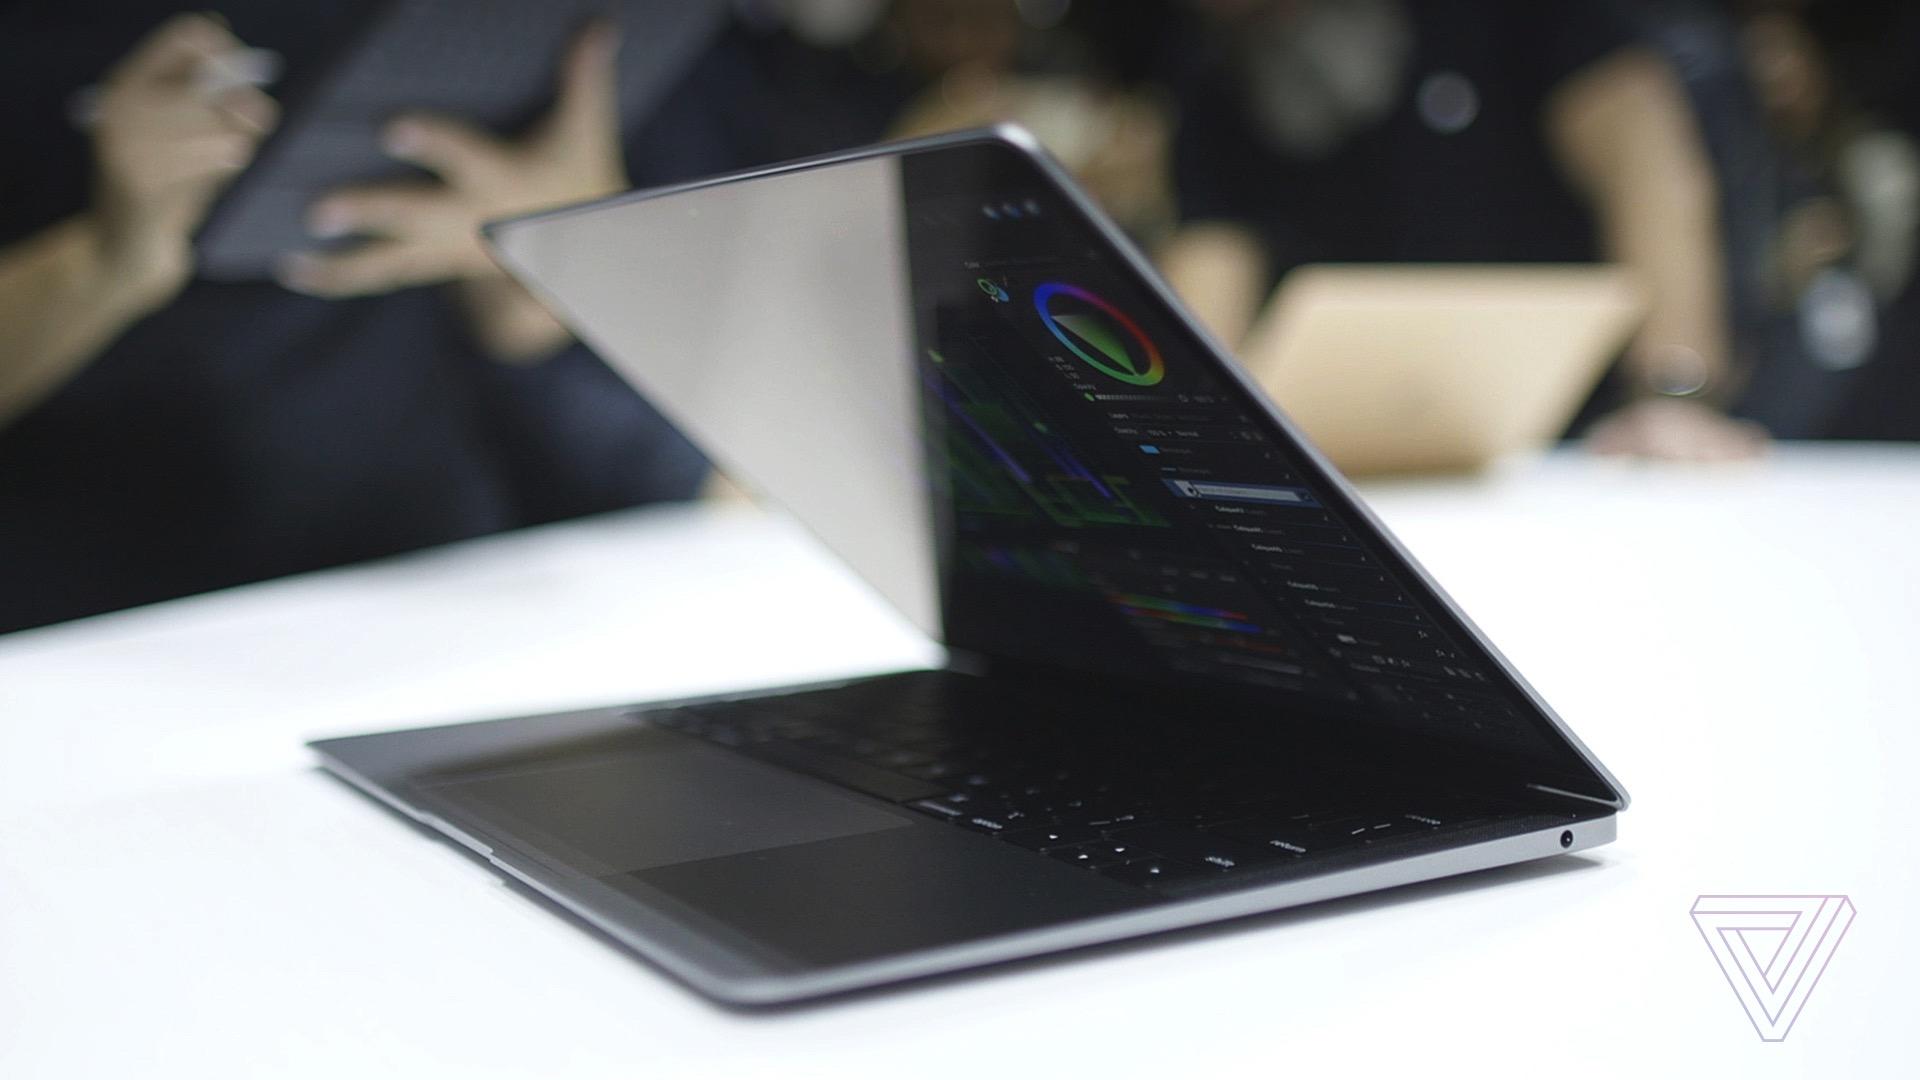 Apple MacBook Air 2018 vs Macbook Pro: specs comparison